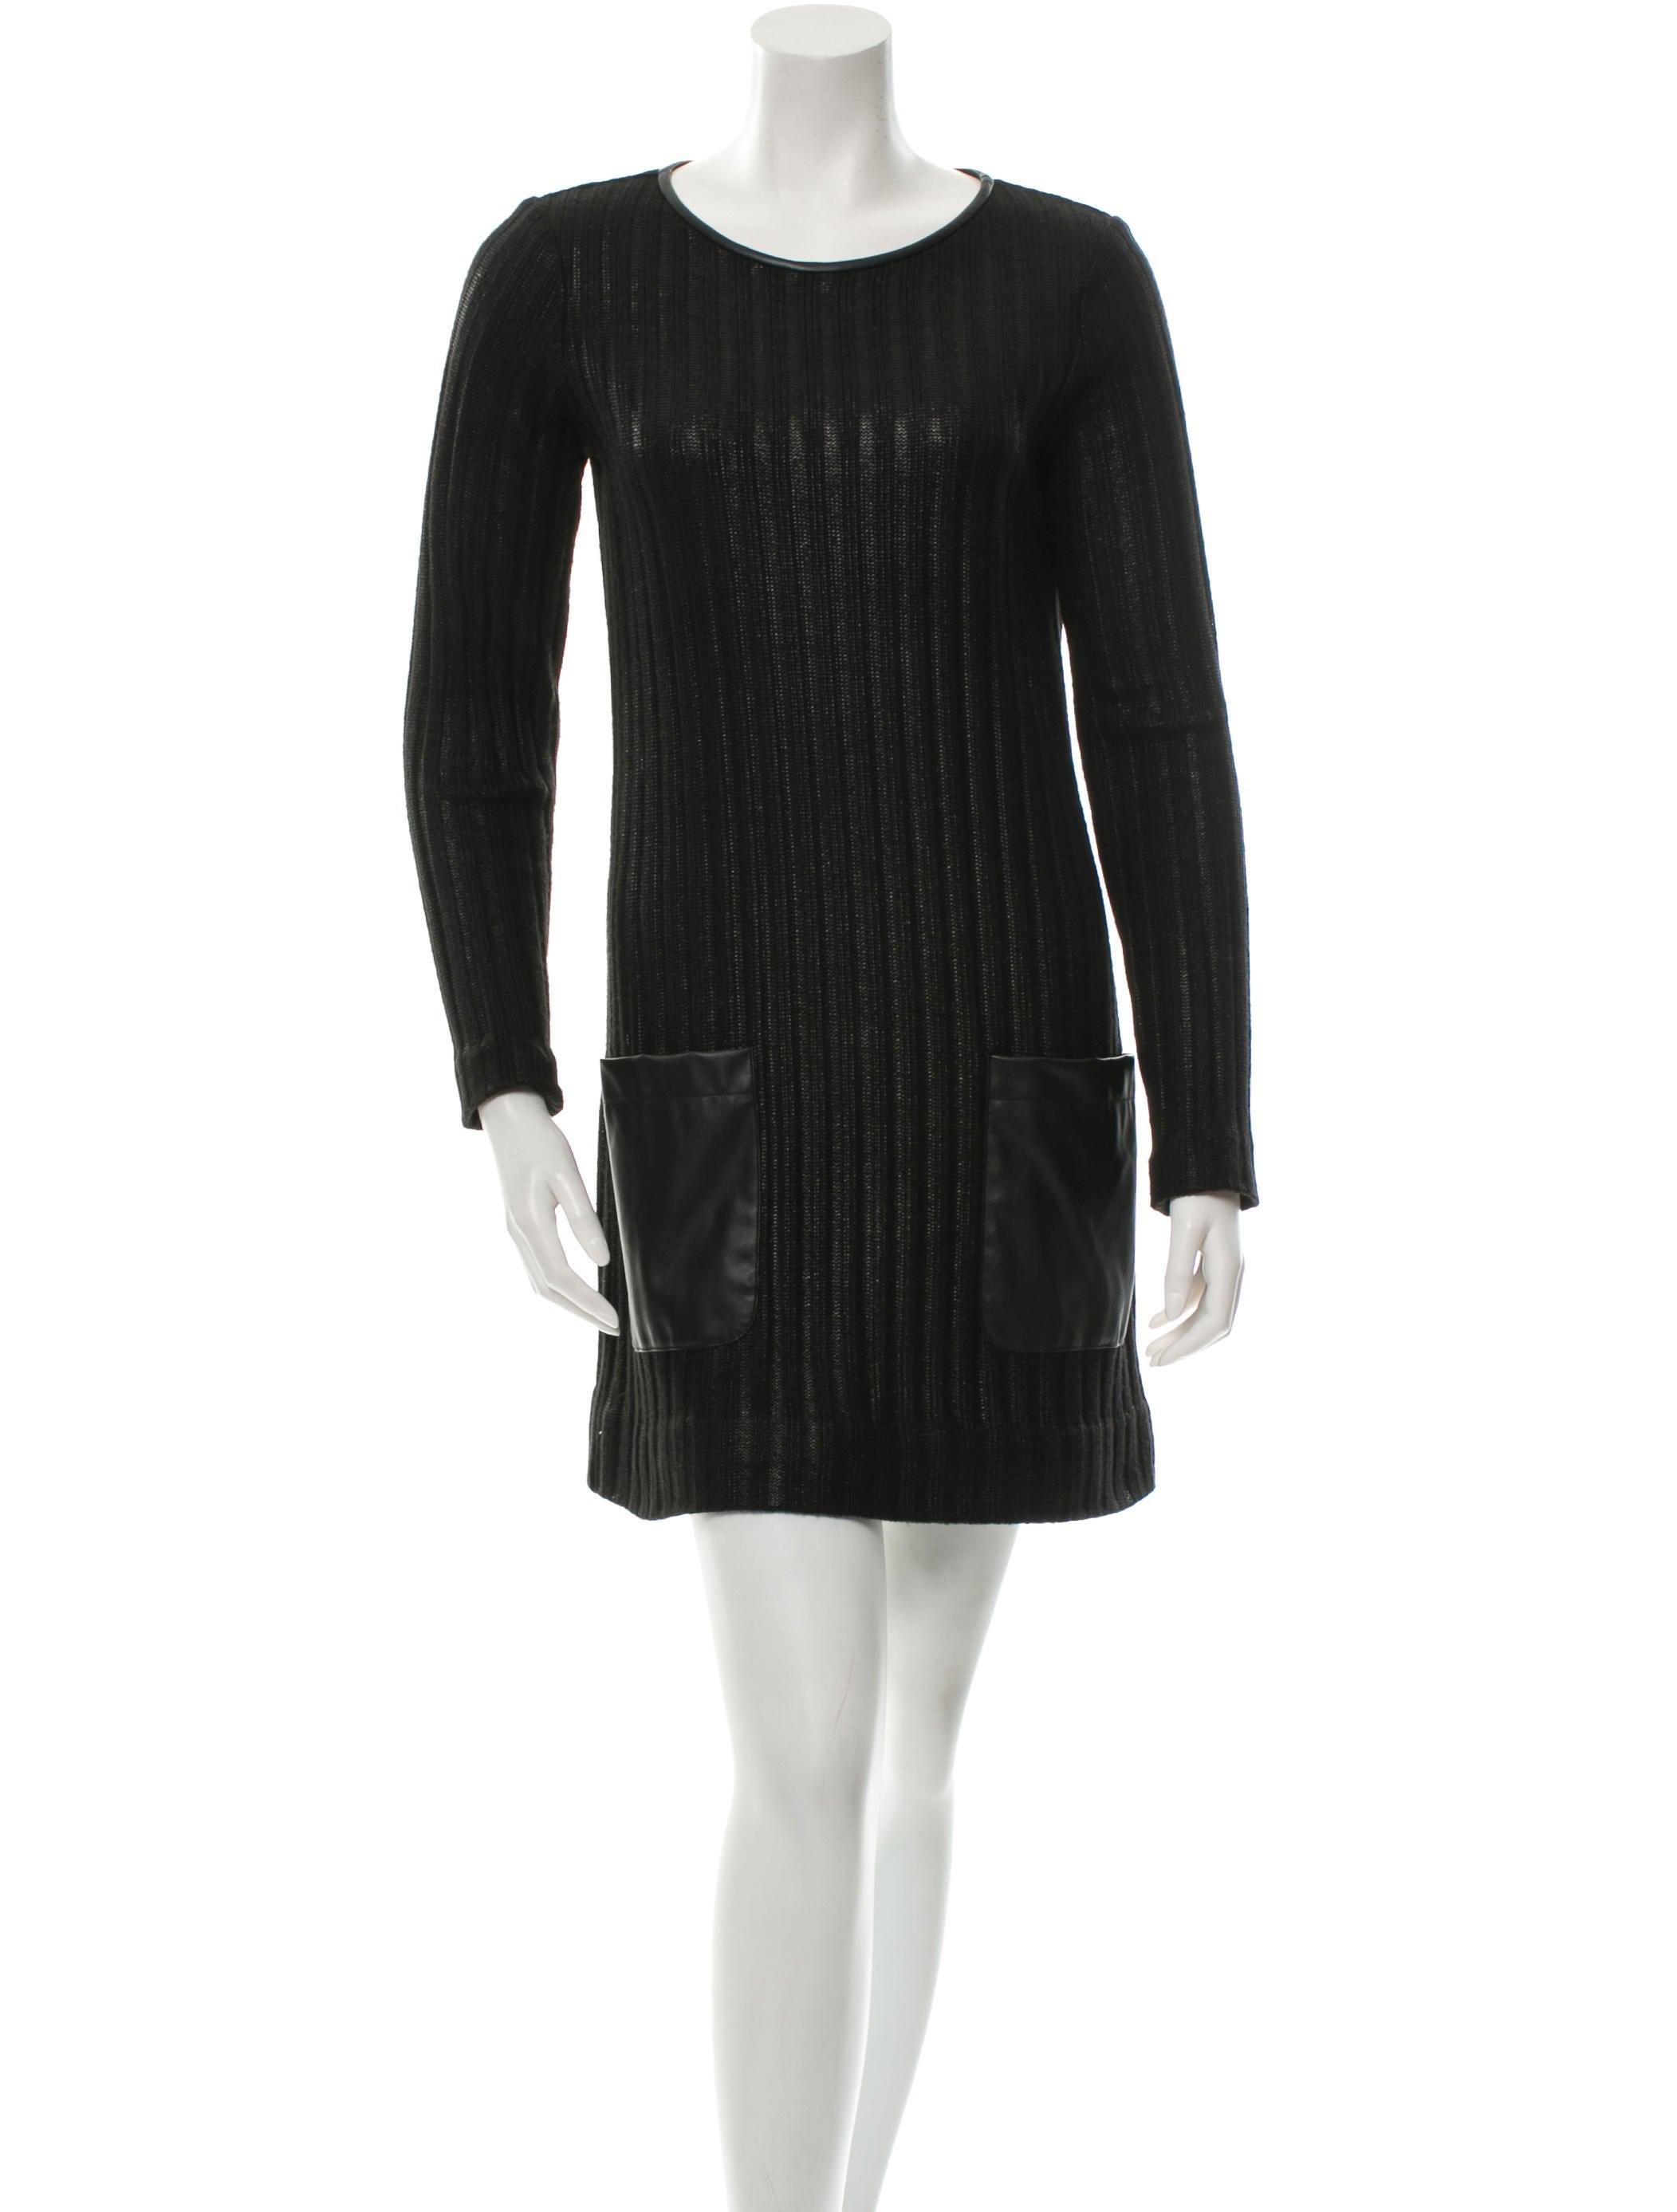 10 Crosby Derek Lam Knit Dress Clothing Wdl21795 The